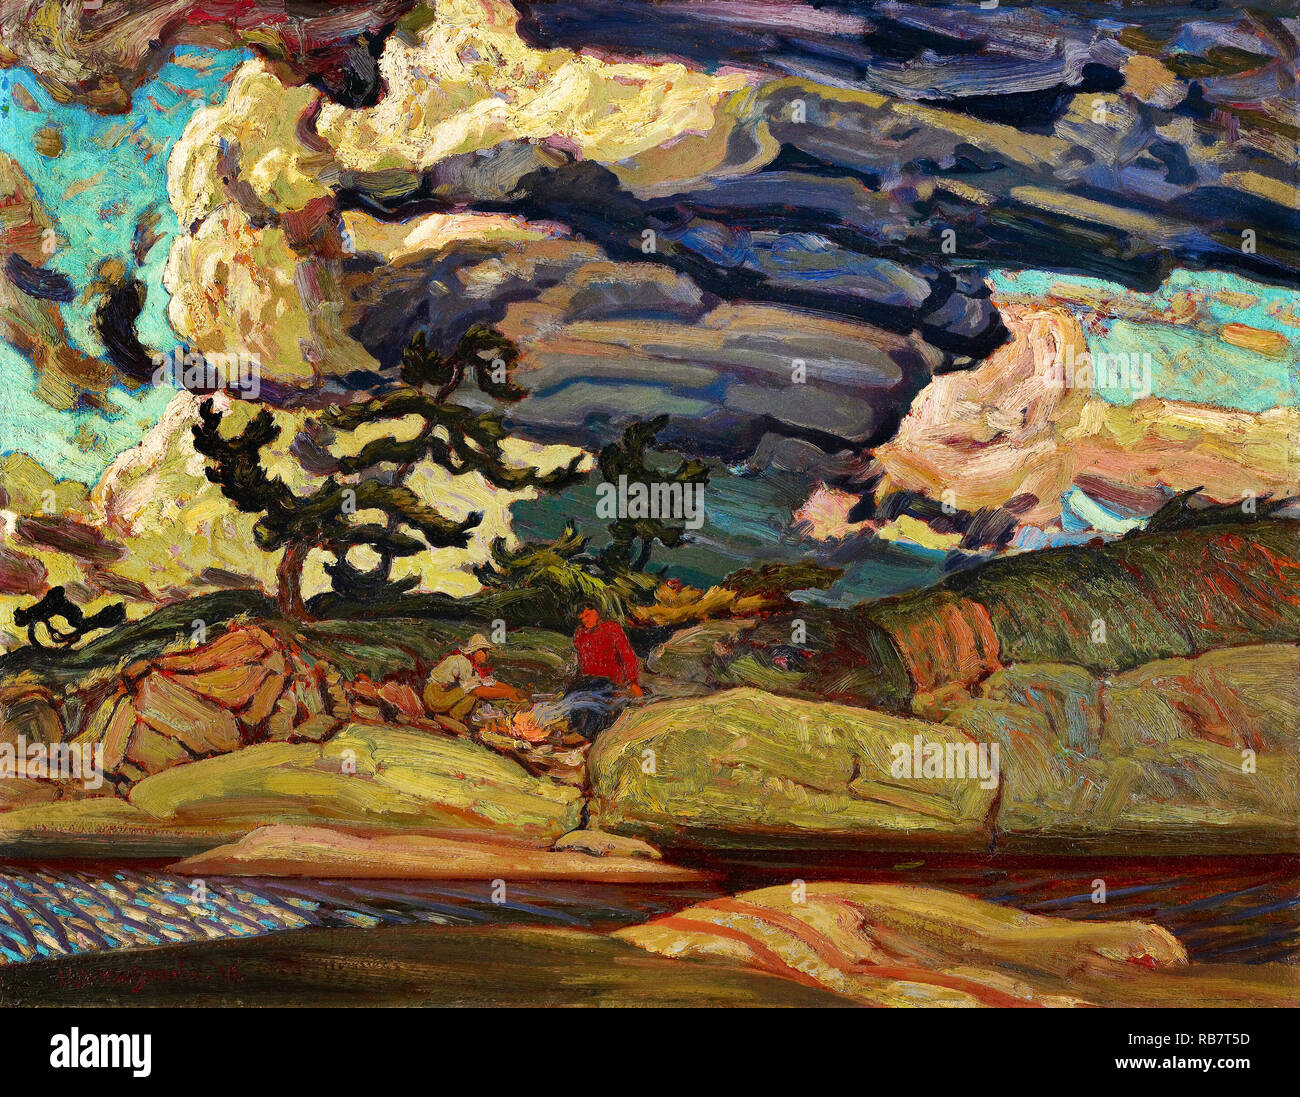 J.E.H. MacDonald, die Elemente 1916 Öl auf Leinwand, Kunstgalerie von Ontario, Toronto, Kanada. Stockbild